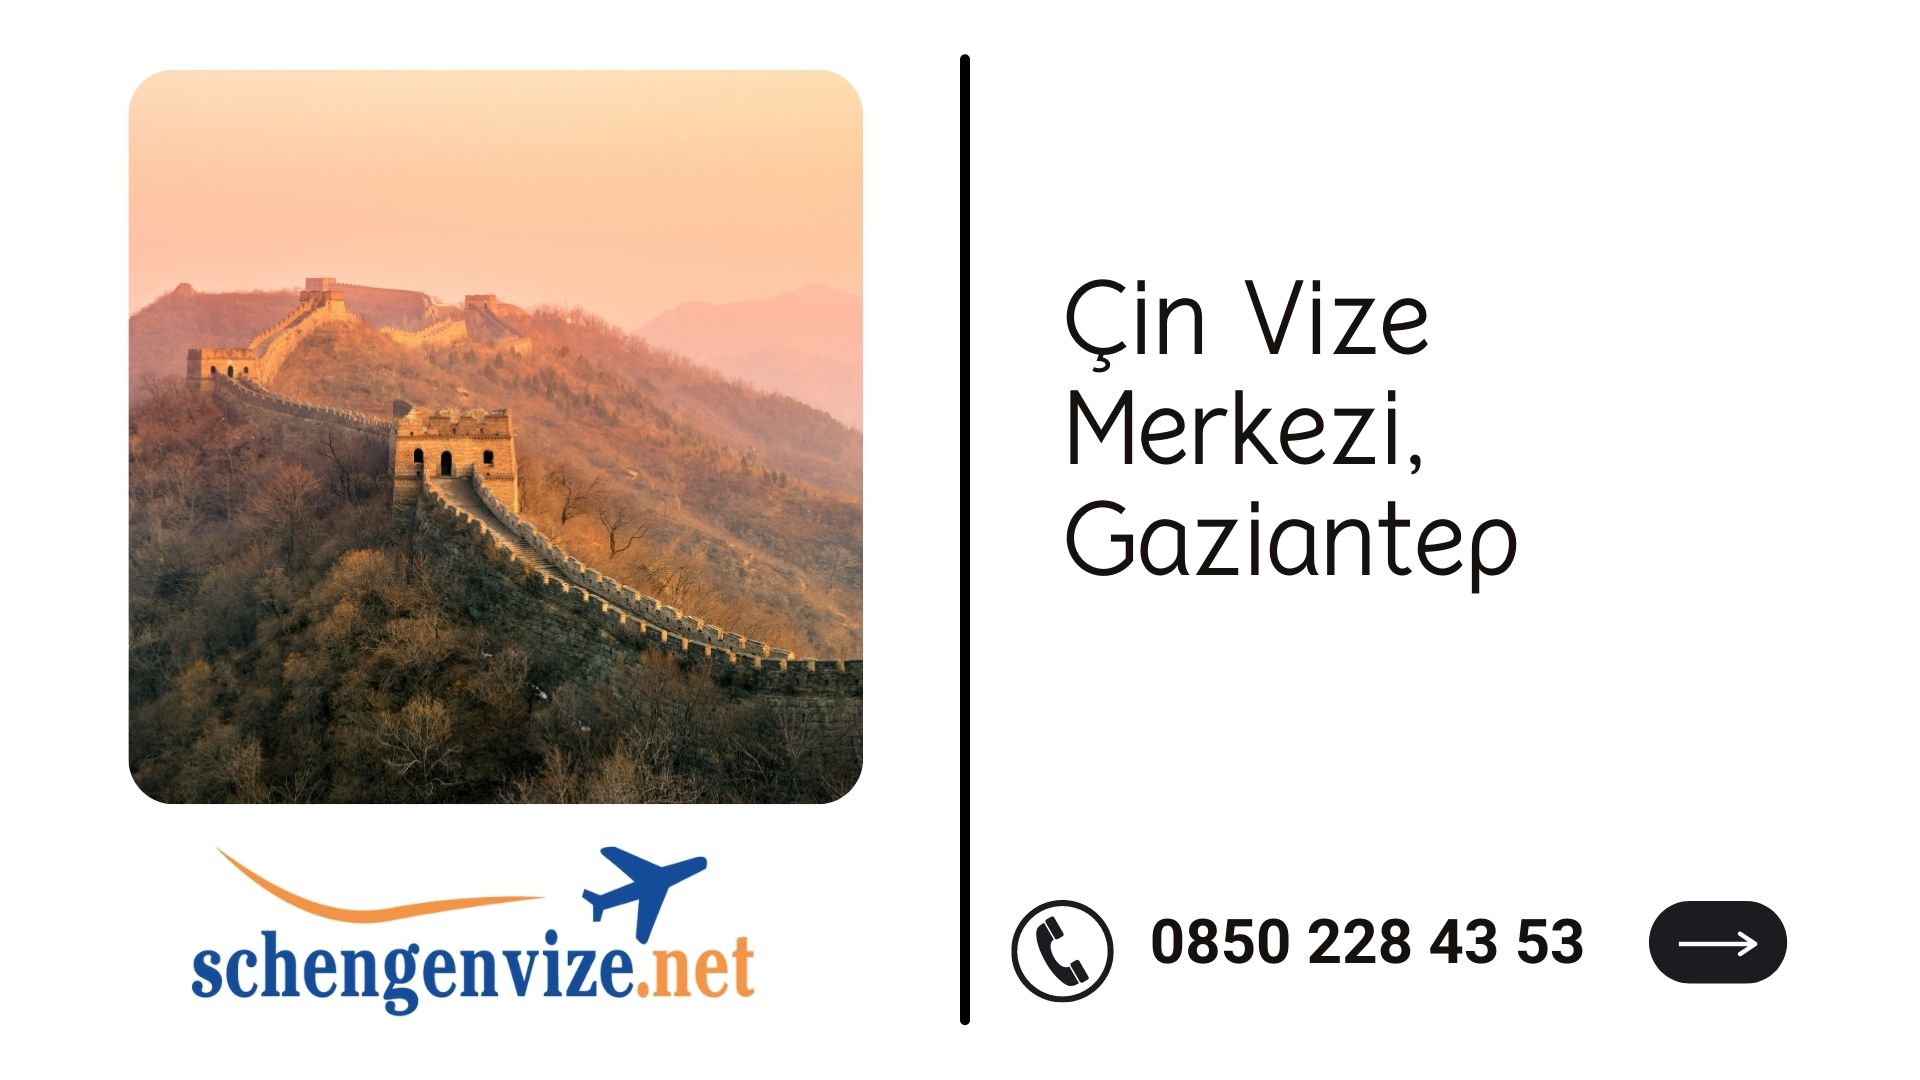 Çin Vize Merkezi, Gaziantep